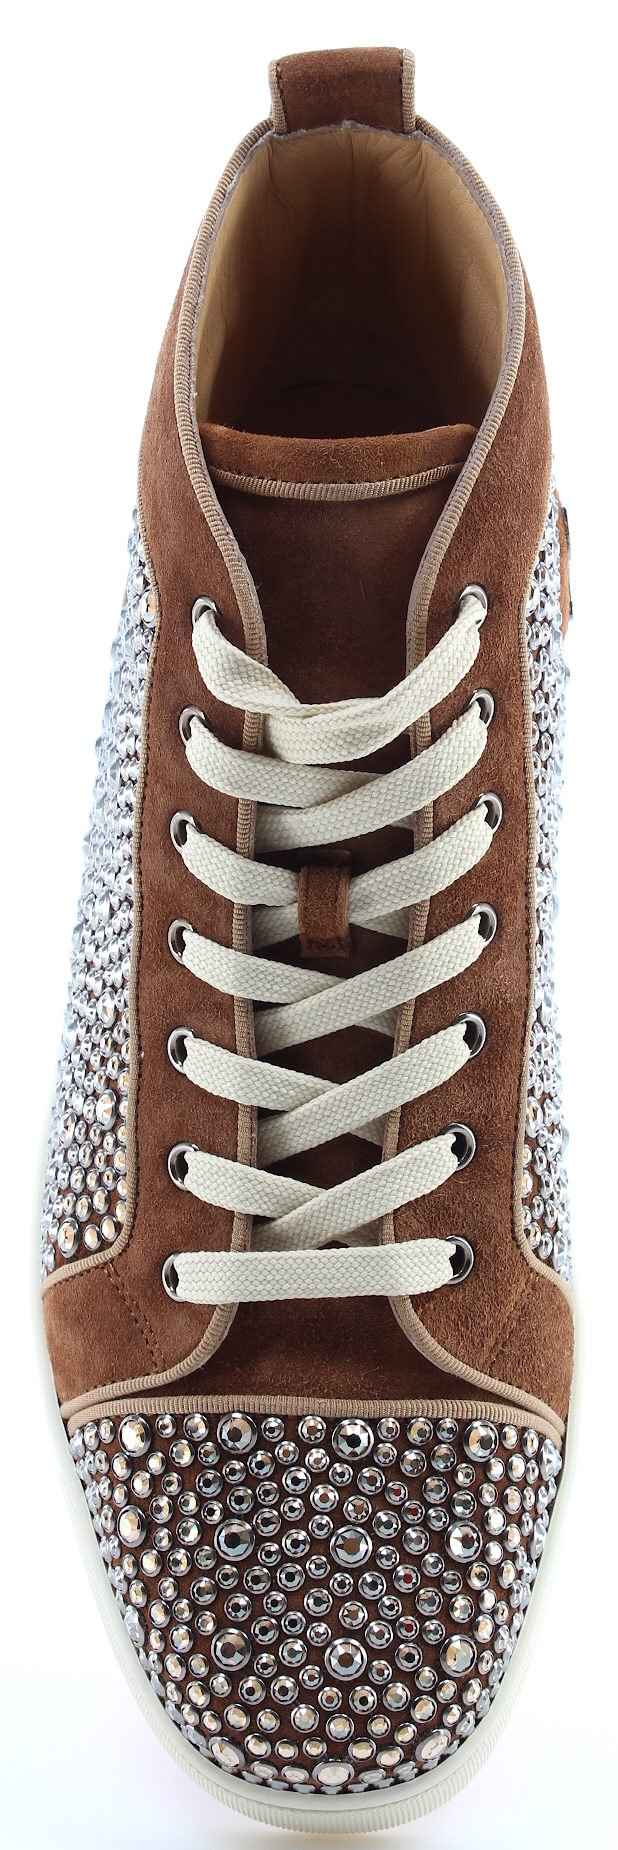 meilleure sélection b7644 7f038 Christian Louboutin Paris Chaussures Homme Sneaker Louis Orlato Flat Indi  Strass